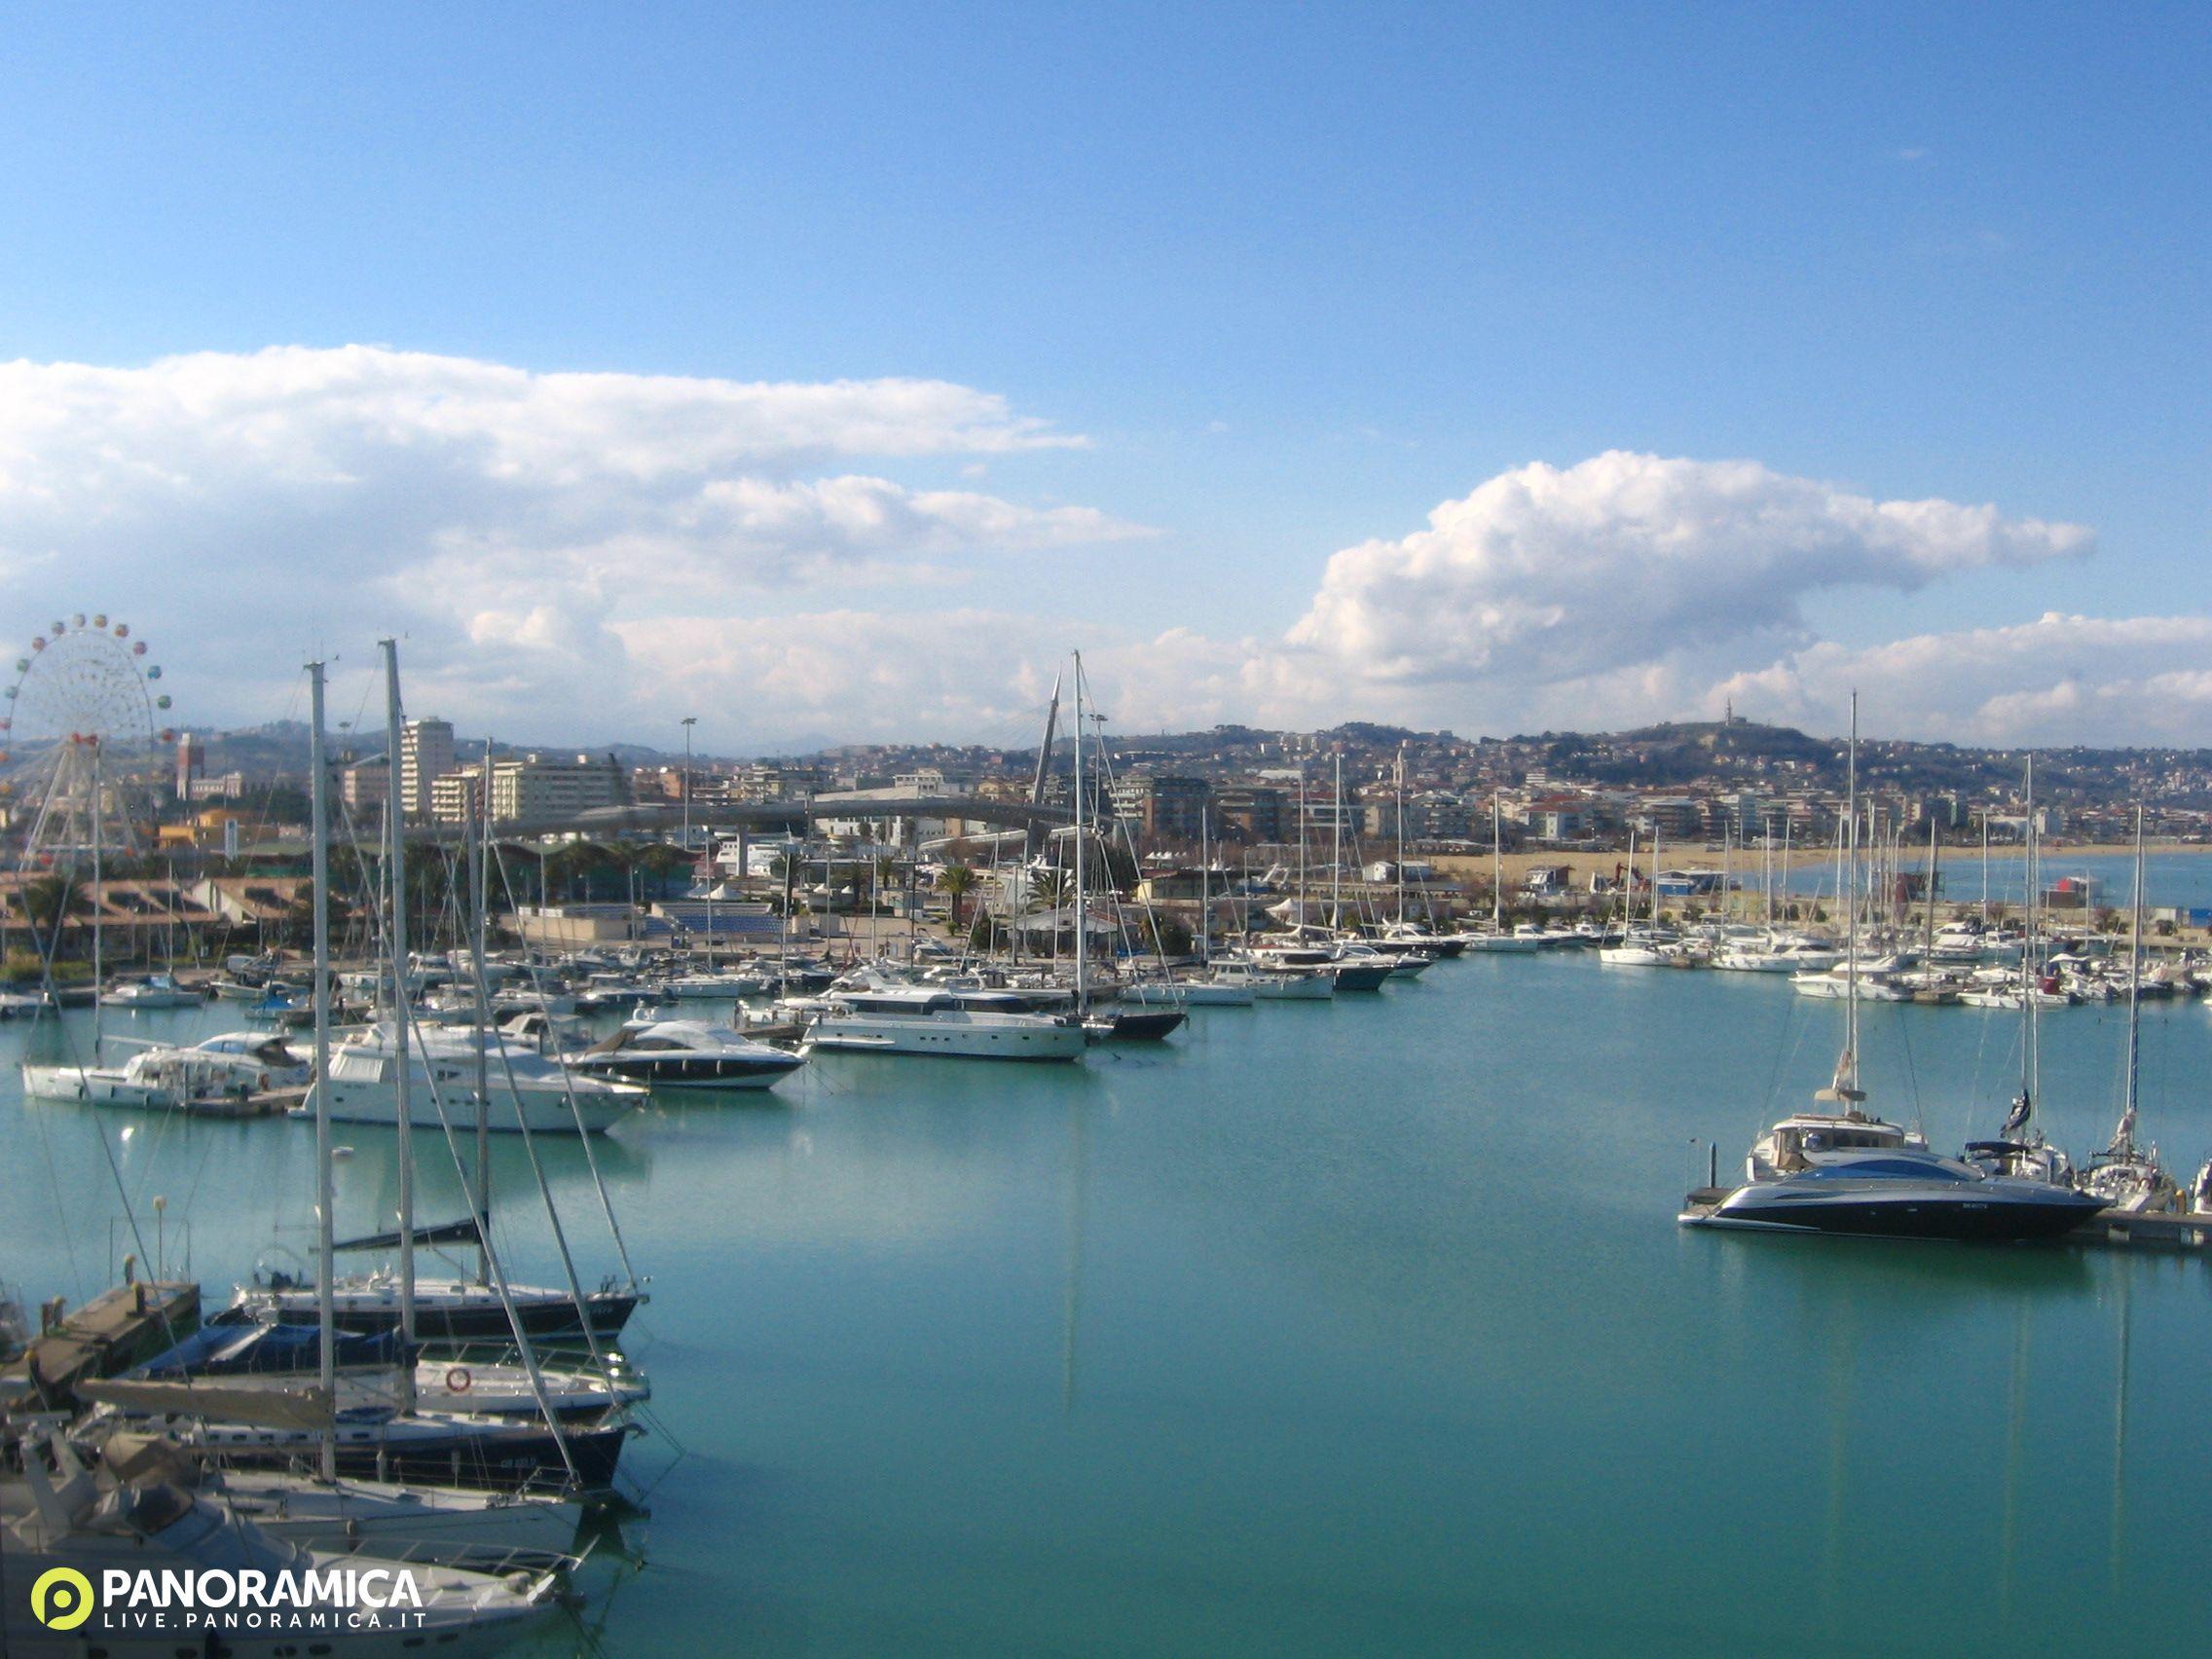 Pescara Camera Live : Pescara live panoramica foto del